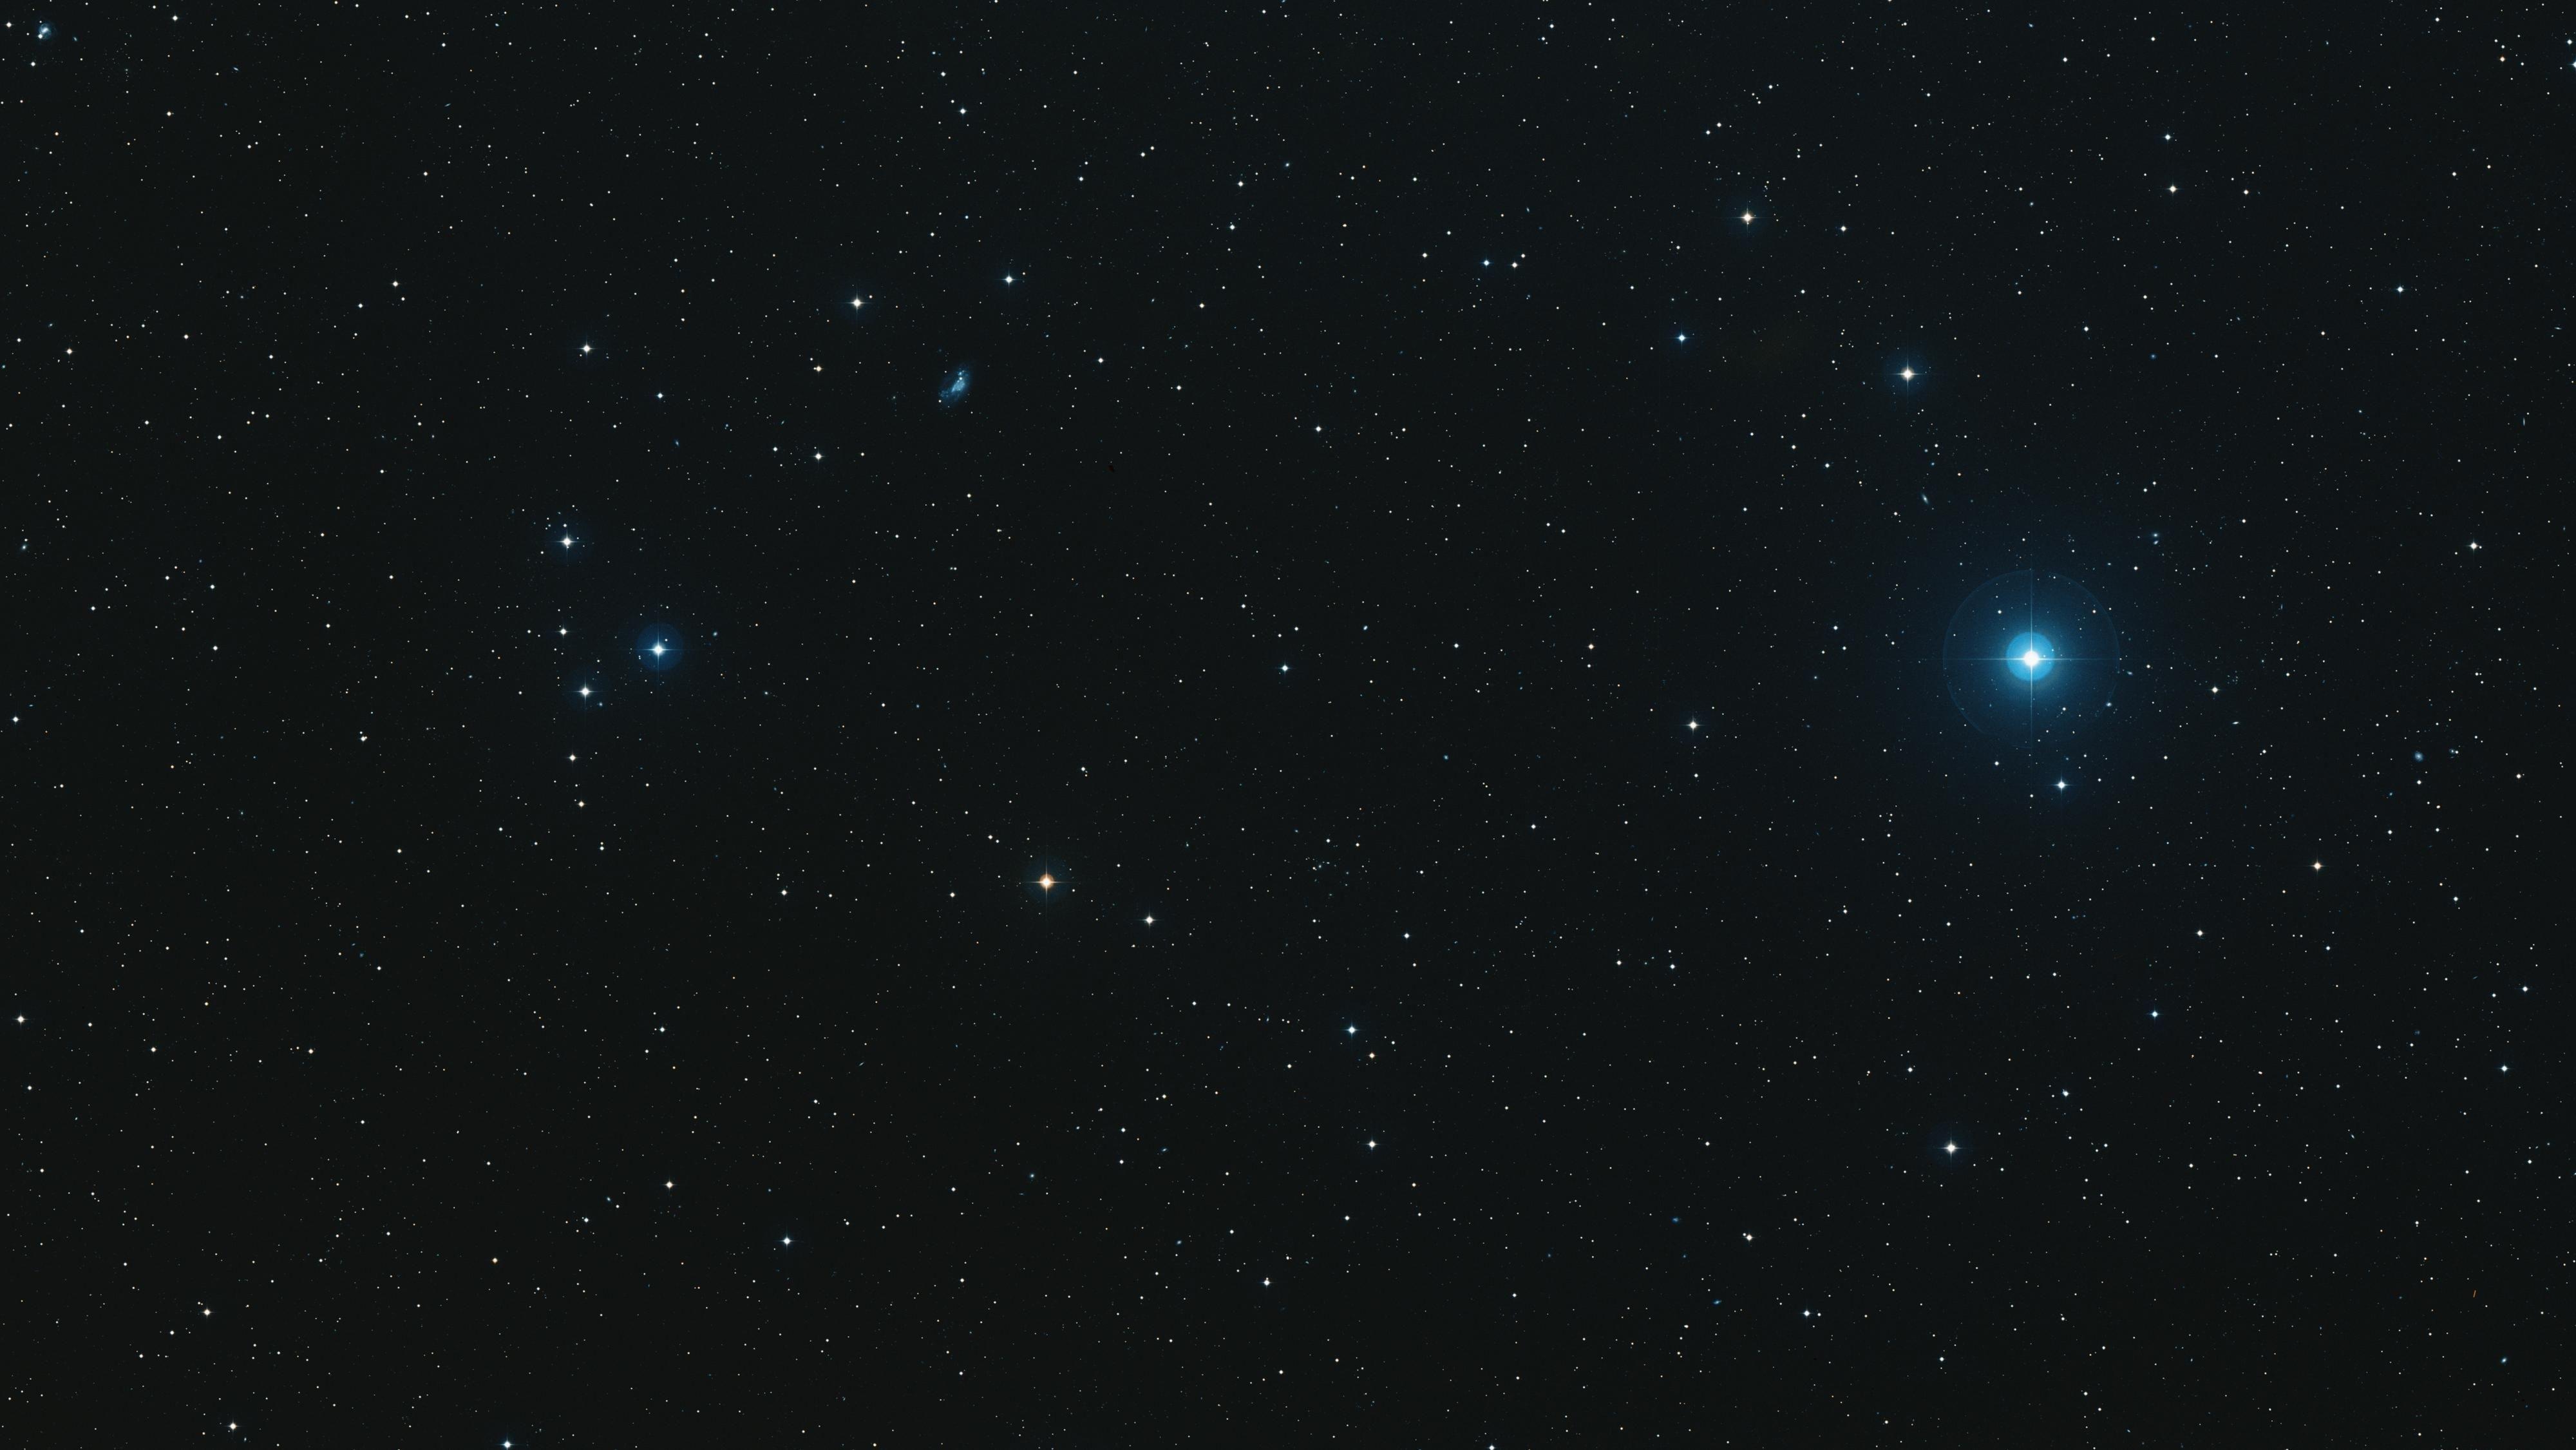 10 most popular night sky star wallpaper full hd 1920×1080 for pc